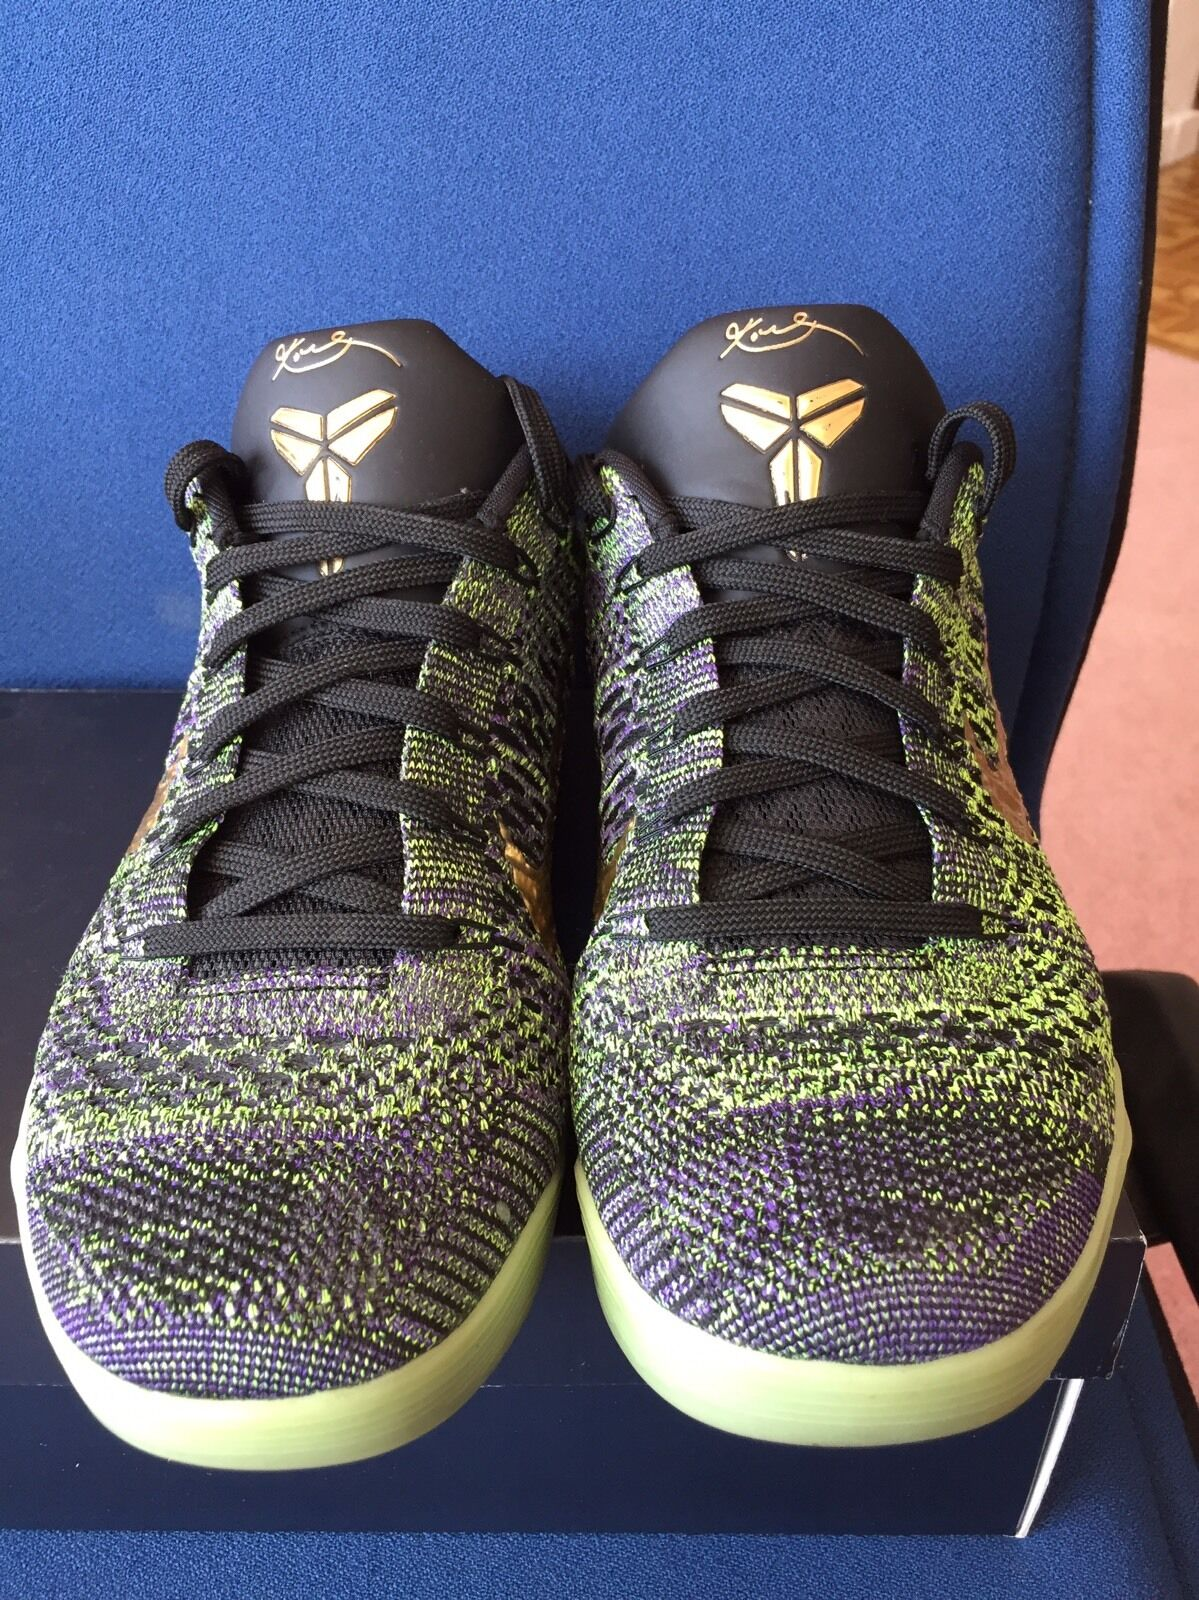 Nike Kobe 9 IX Elite Low iD Mamba 9.5 Moment Multi Color Black Green Glow Gold 9.5 Mamba c071c0